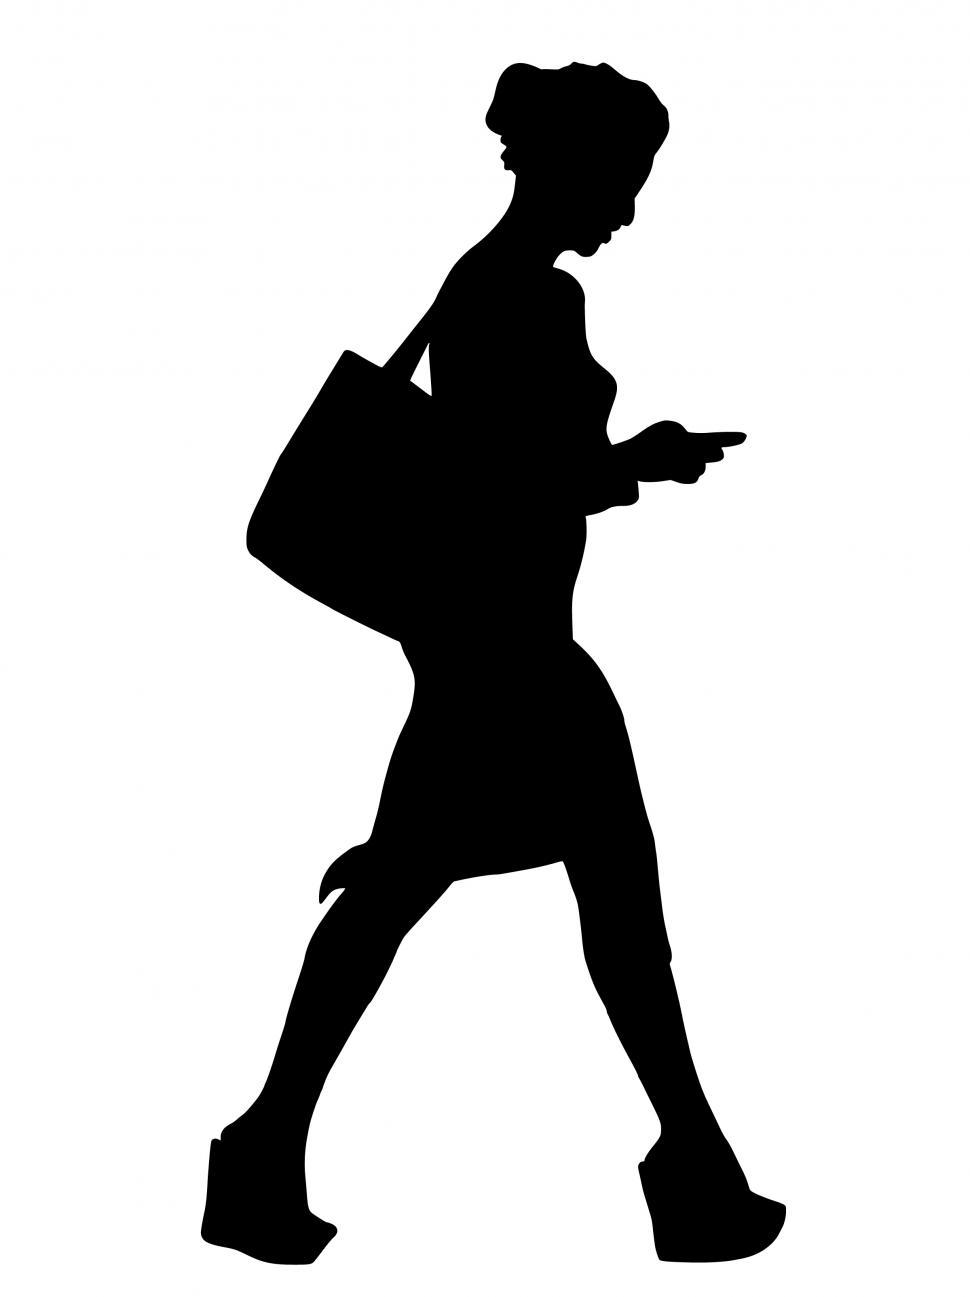 Download Free Stock HD Photo of walking woman Silhouette  Online